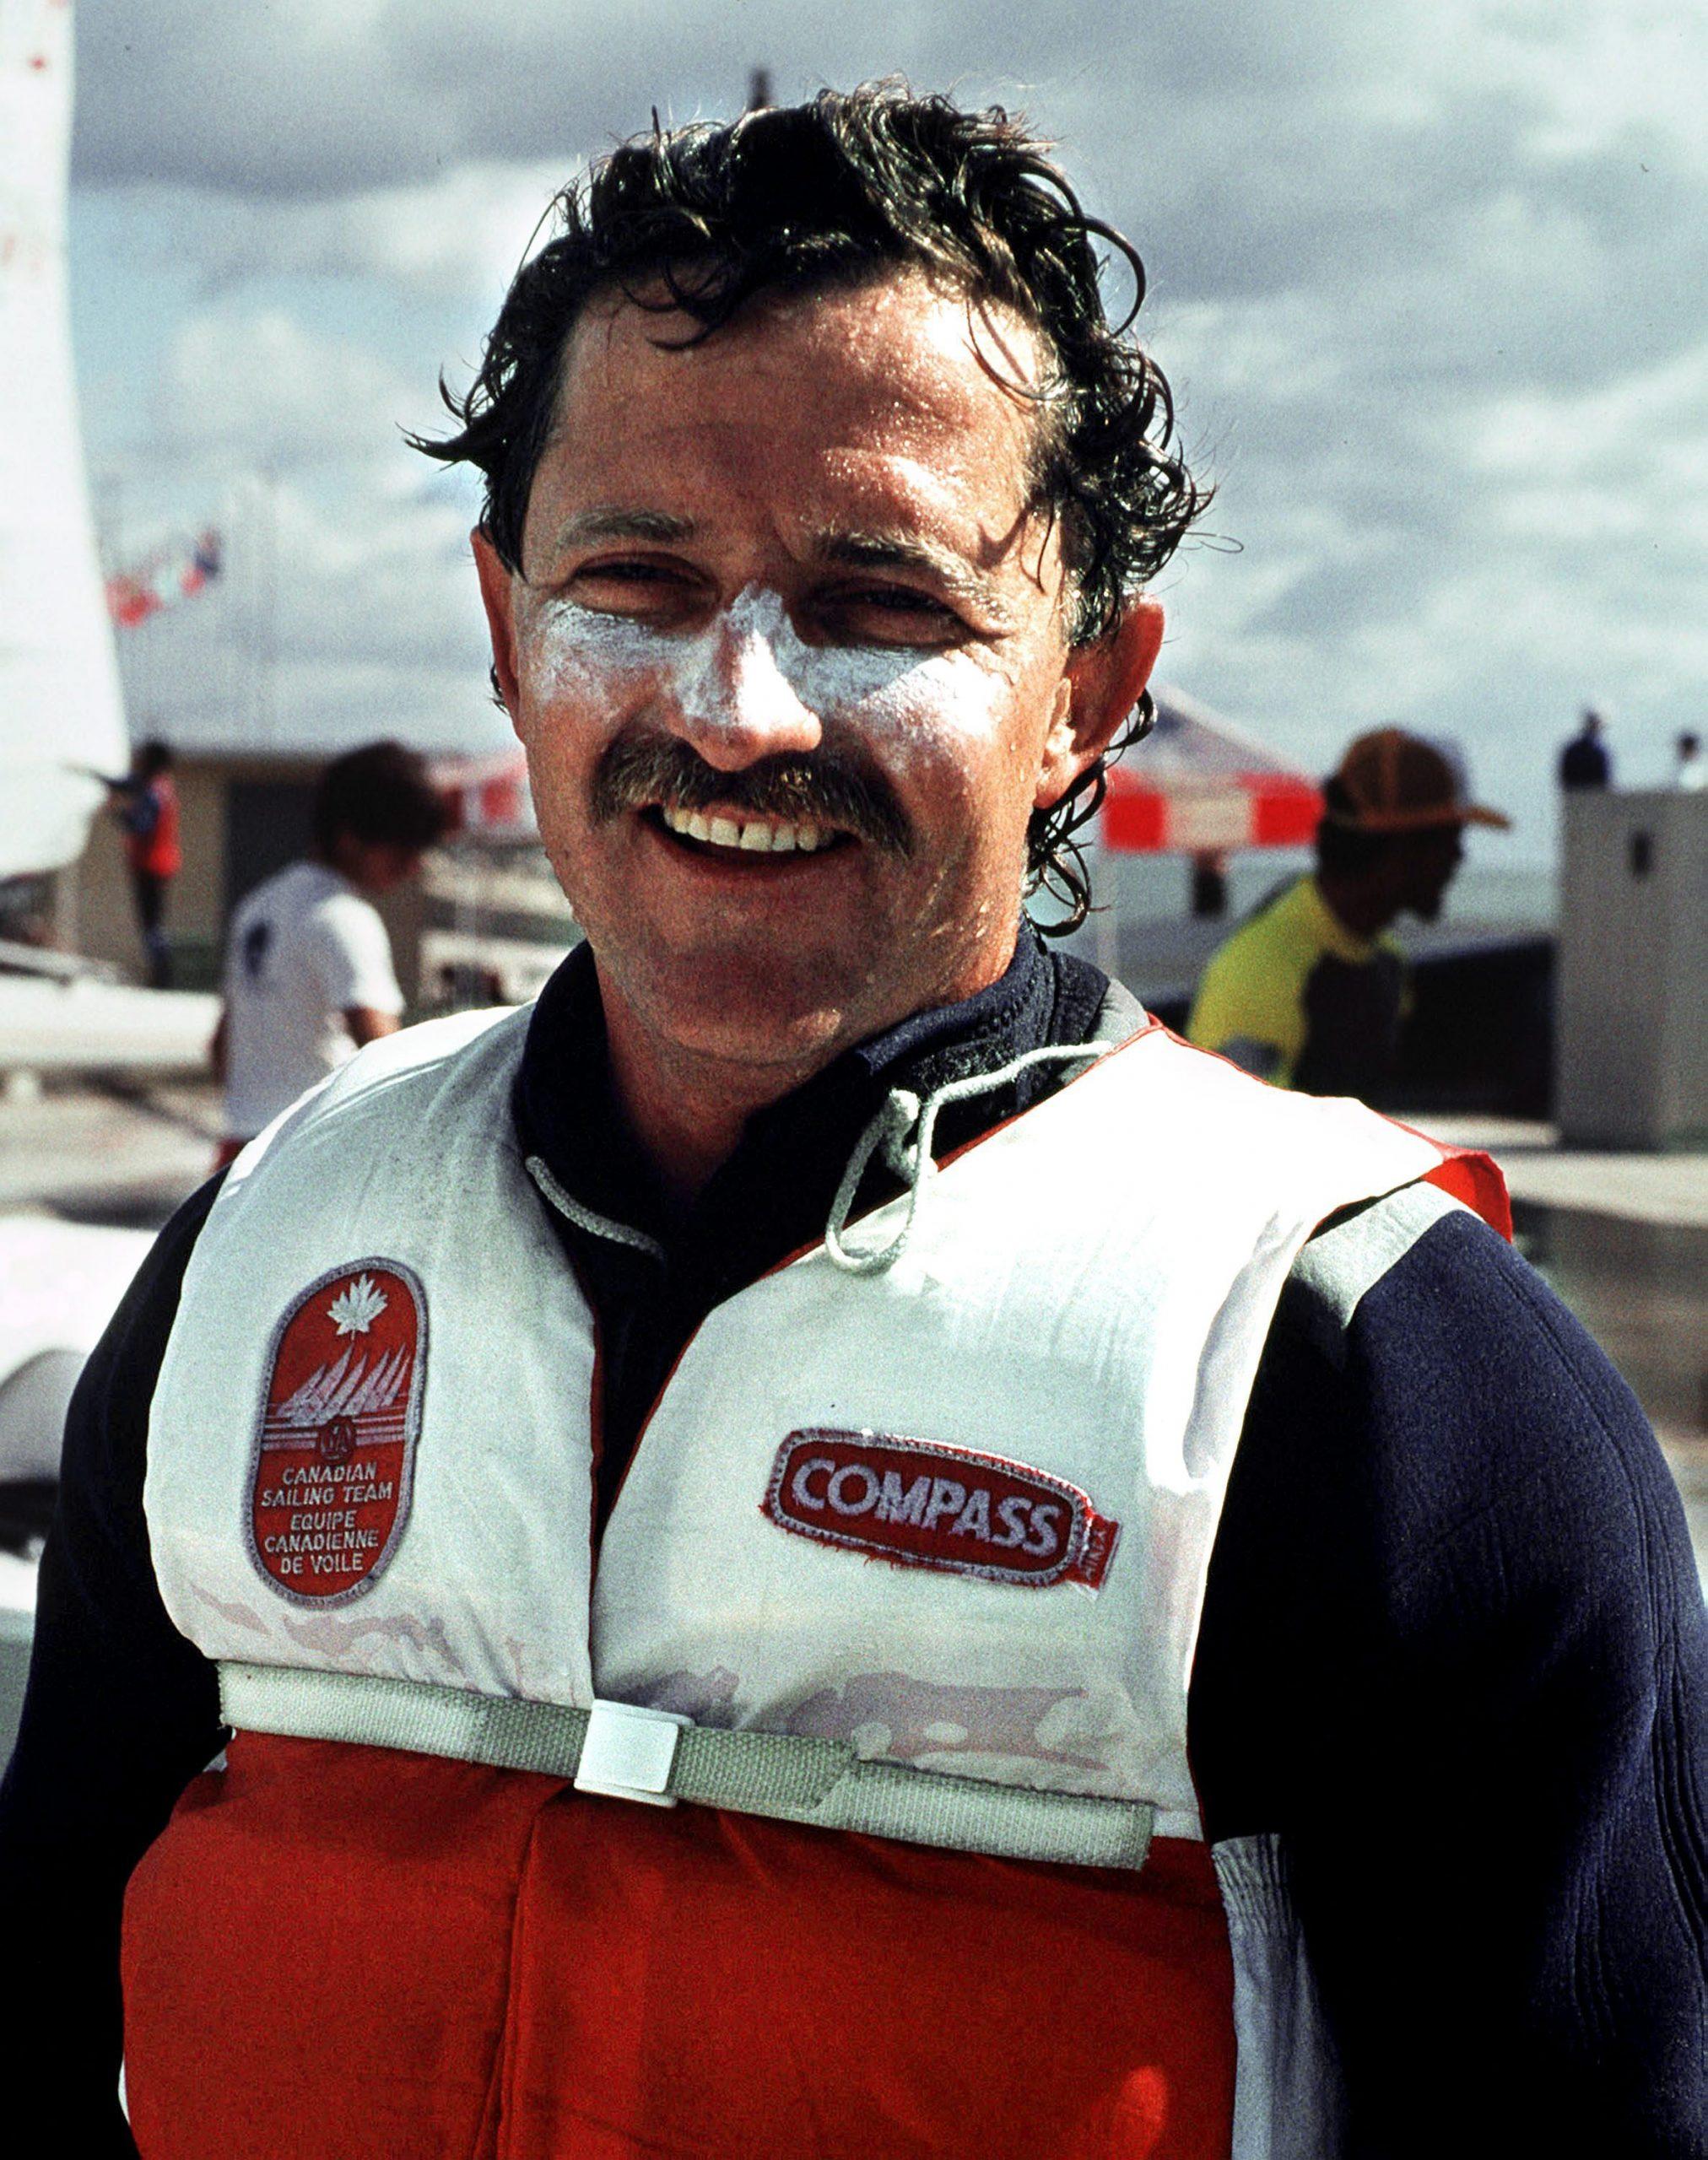 Lawrence Lemieux smiling while wearing his life jacket